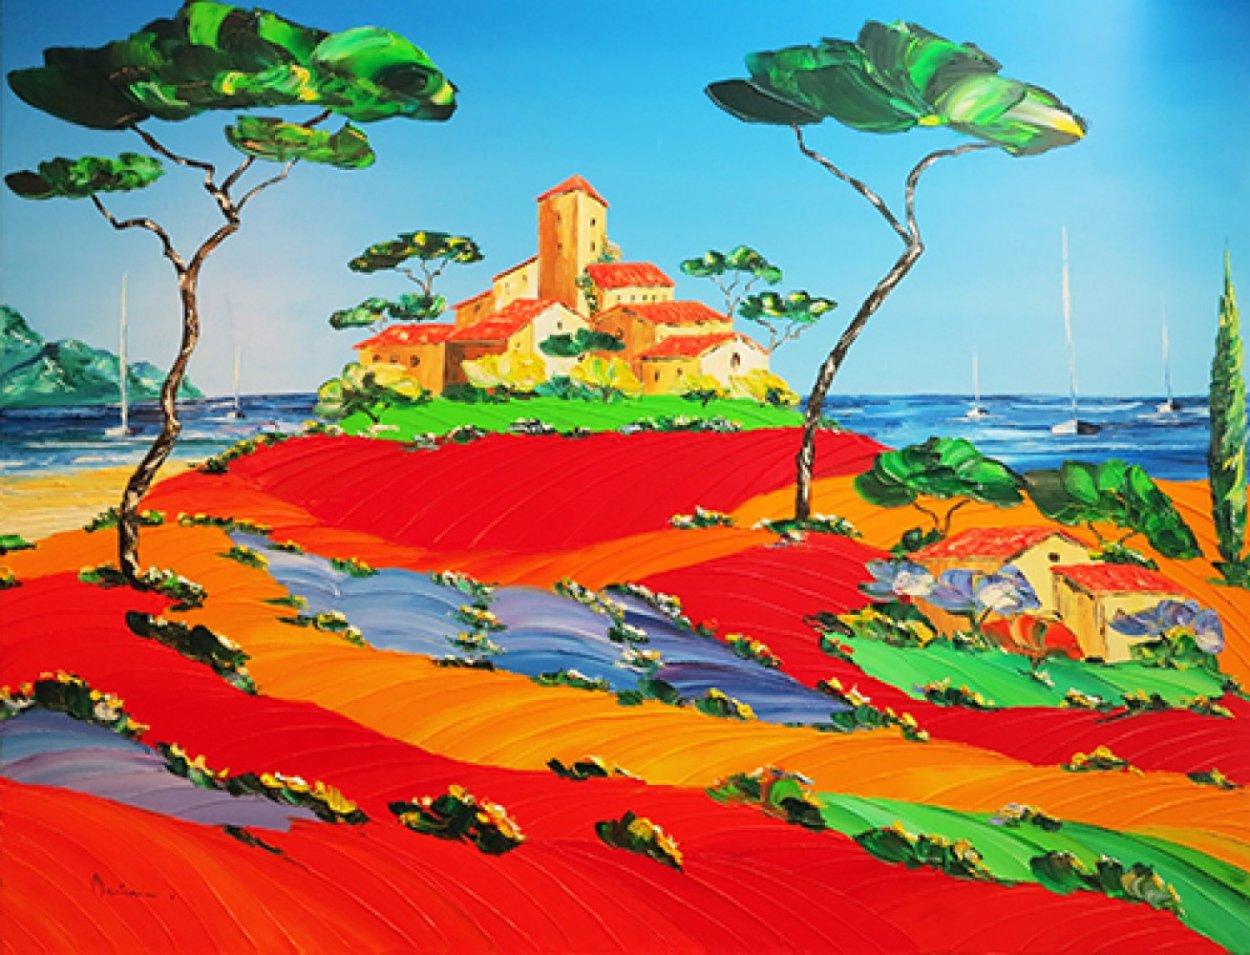 Spirit of the Day 28x36 Original Painting by Monika Meunier